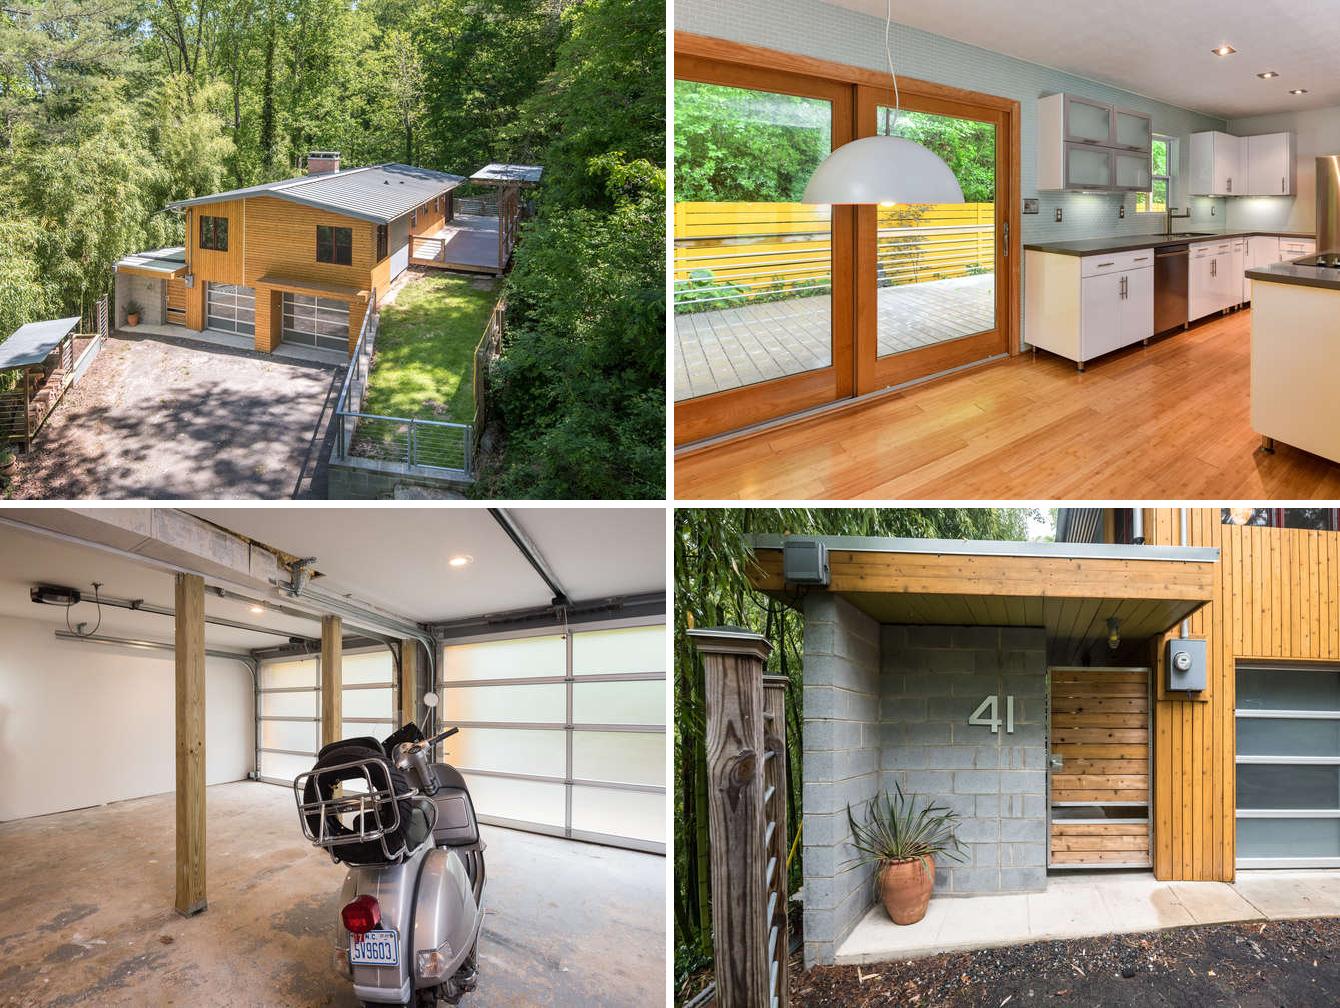 Renovated the homes details include seamless metal roof 1 2 round gutters insulation argon jeldwen wooden windows cedar siding glass garage doors